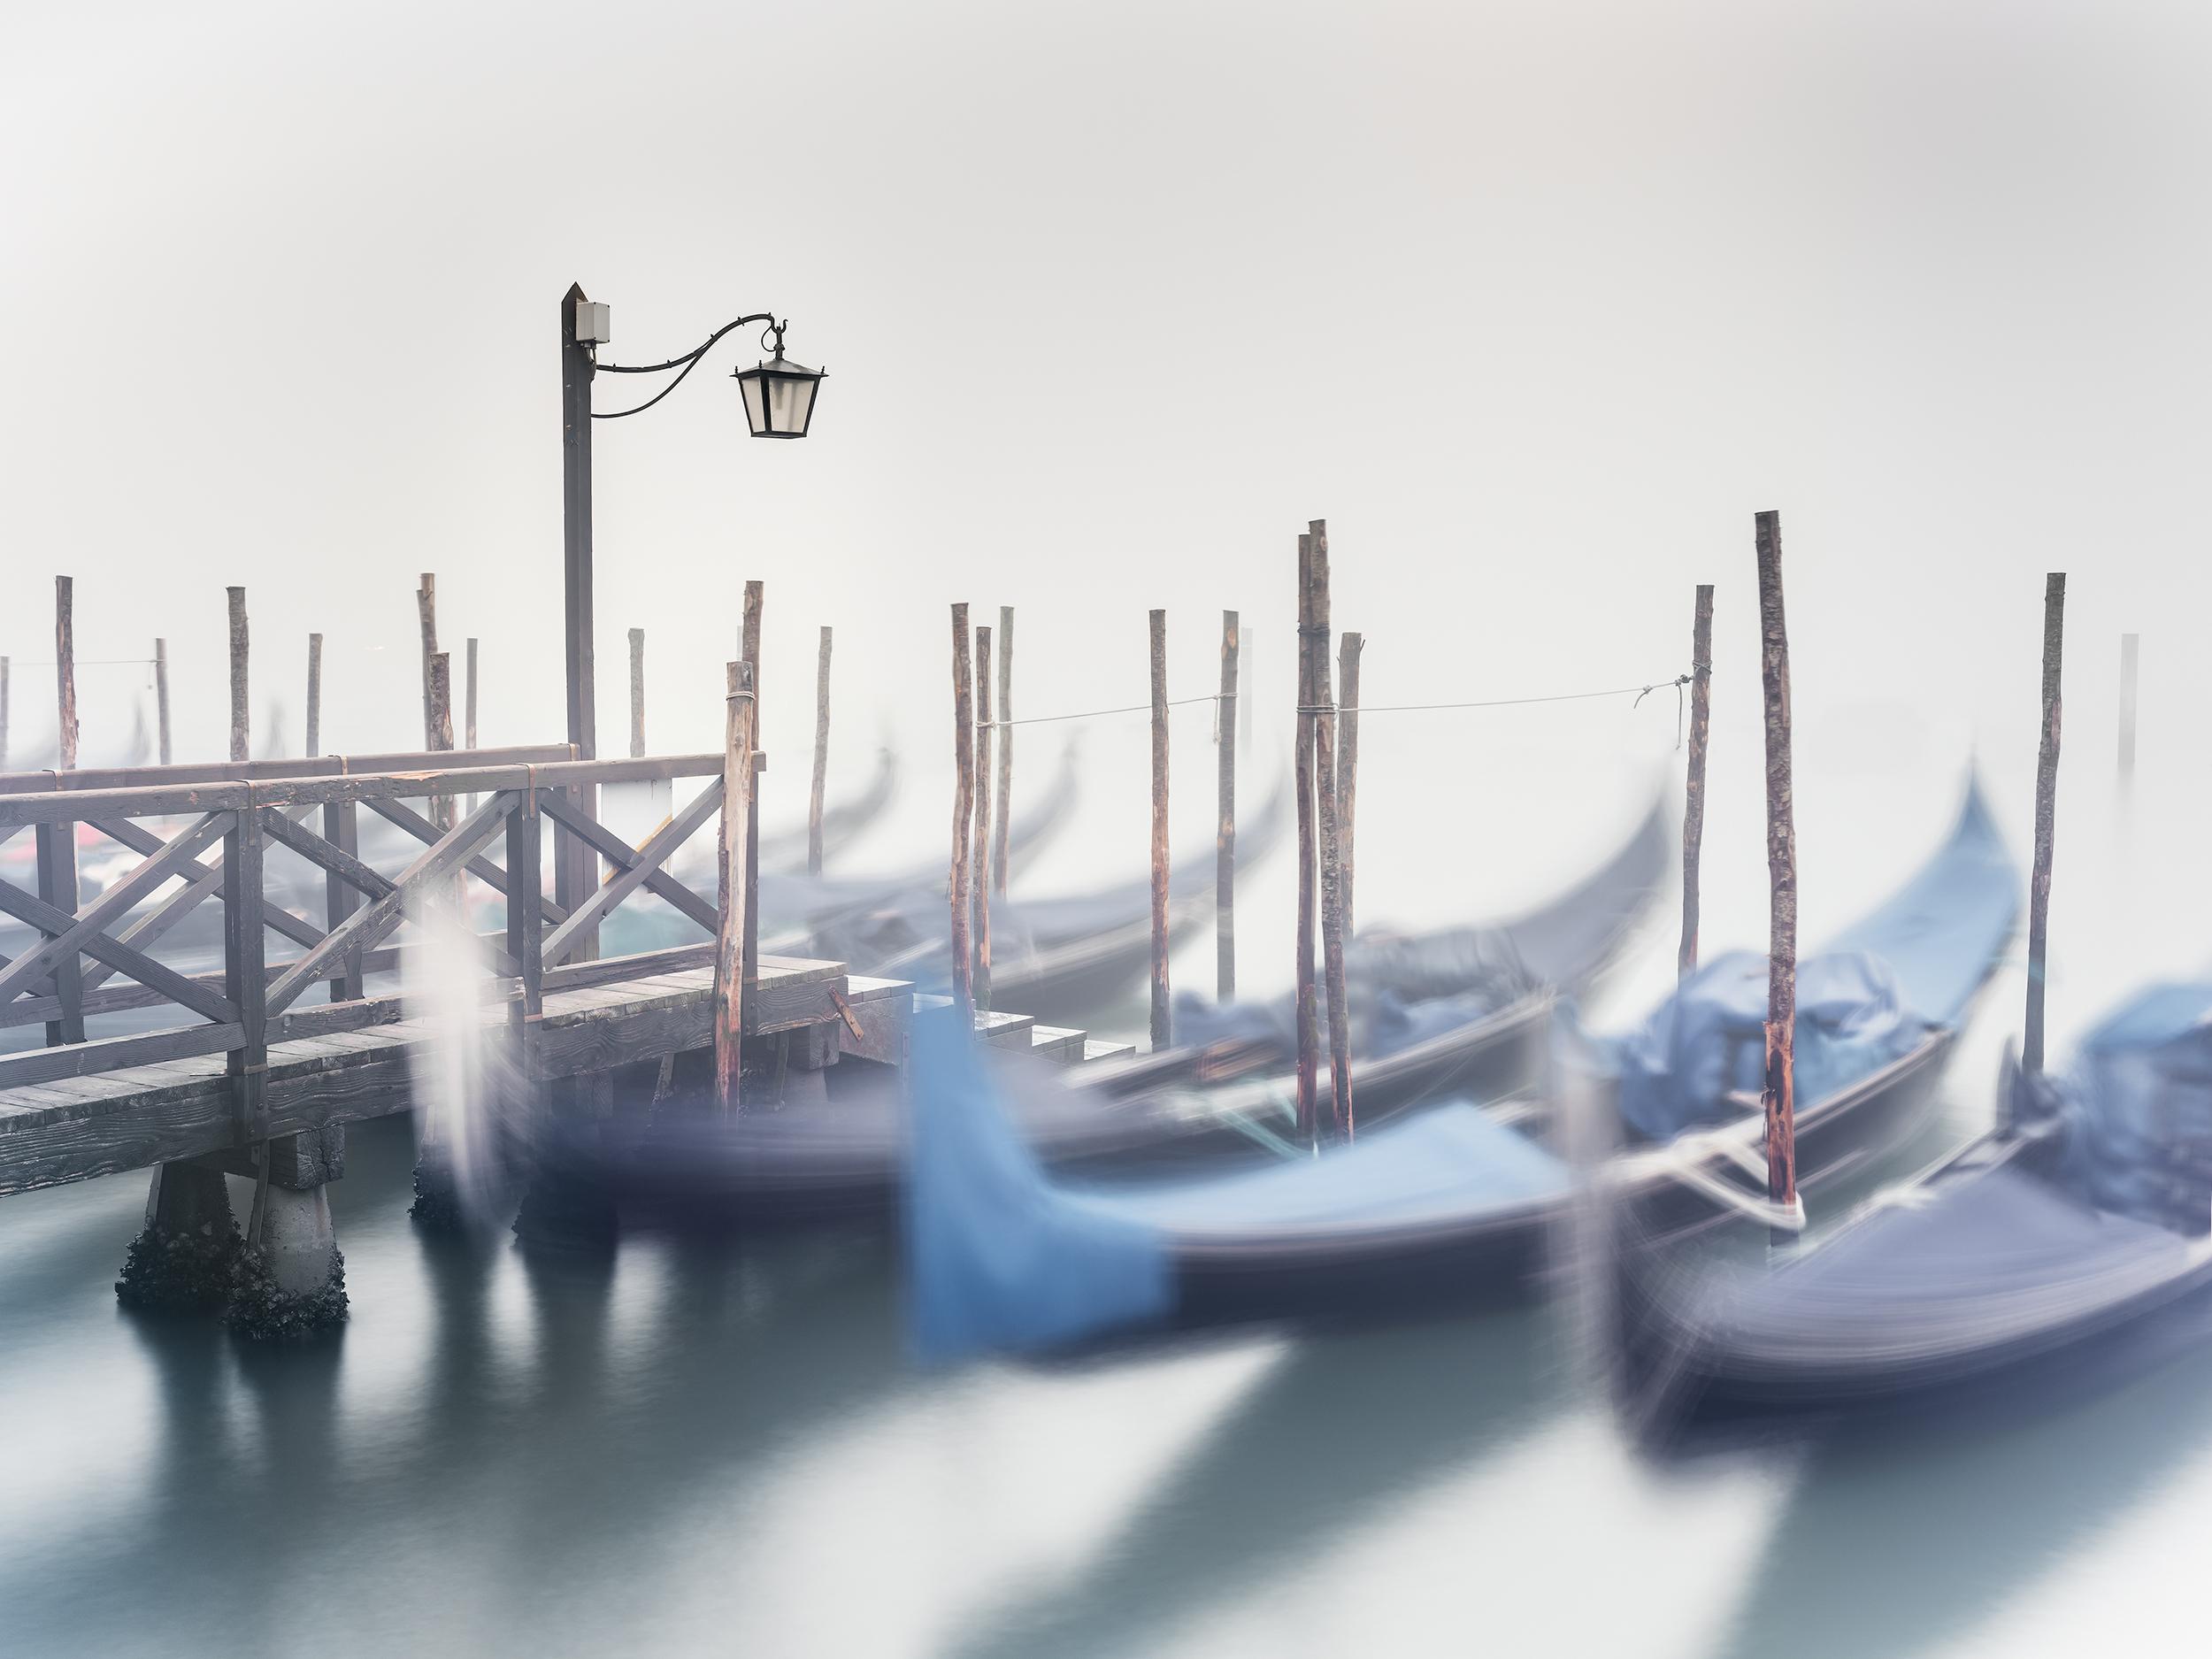 Gondola Study 3 - Venice (2193)